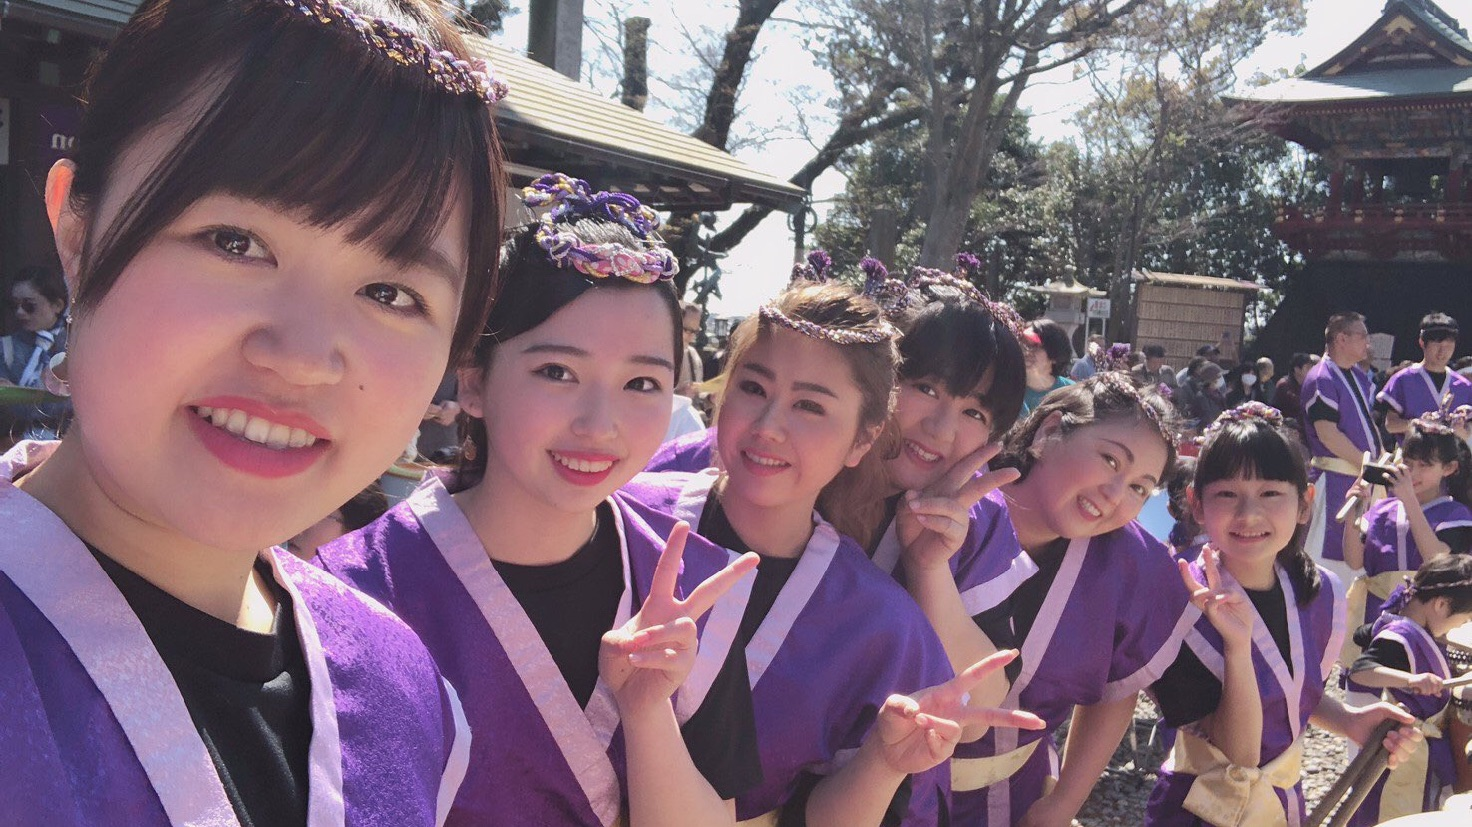 私たちは千葉市花見川区の太鼓団体です